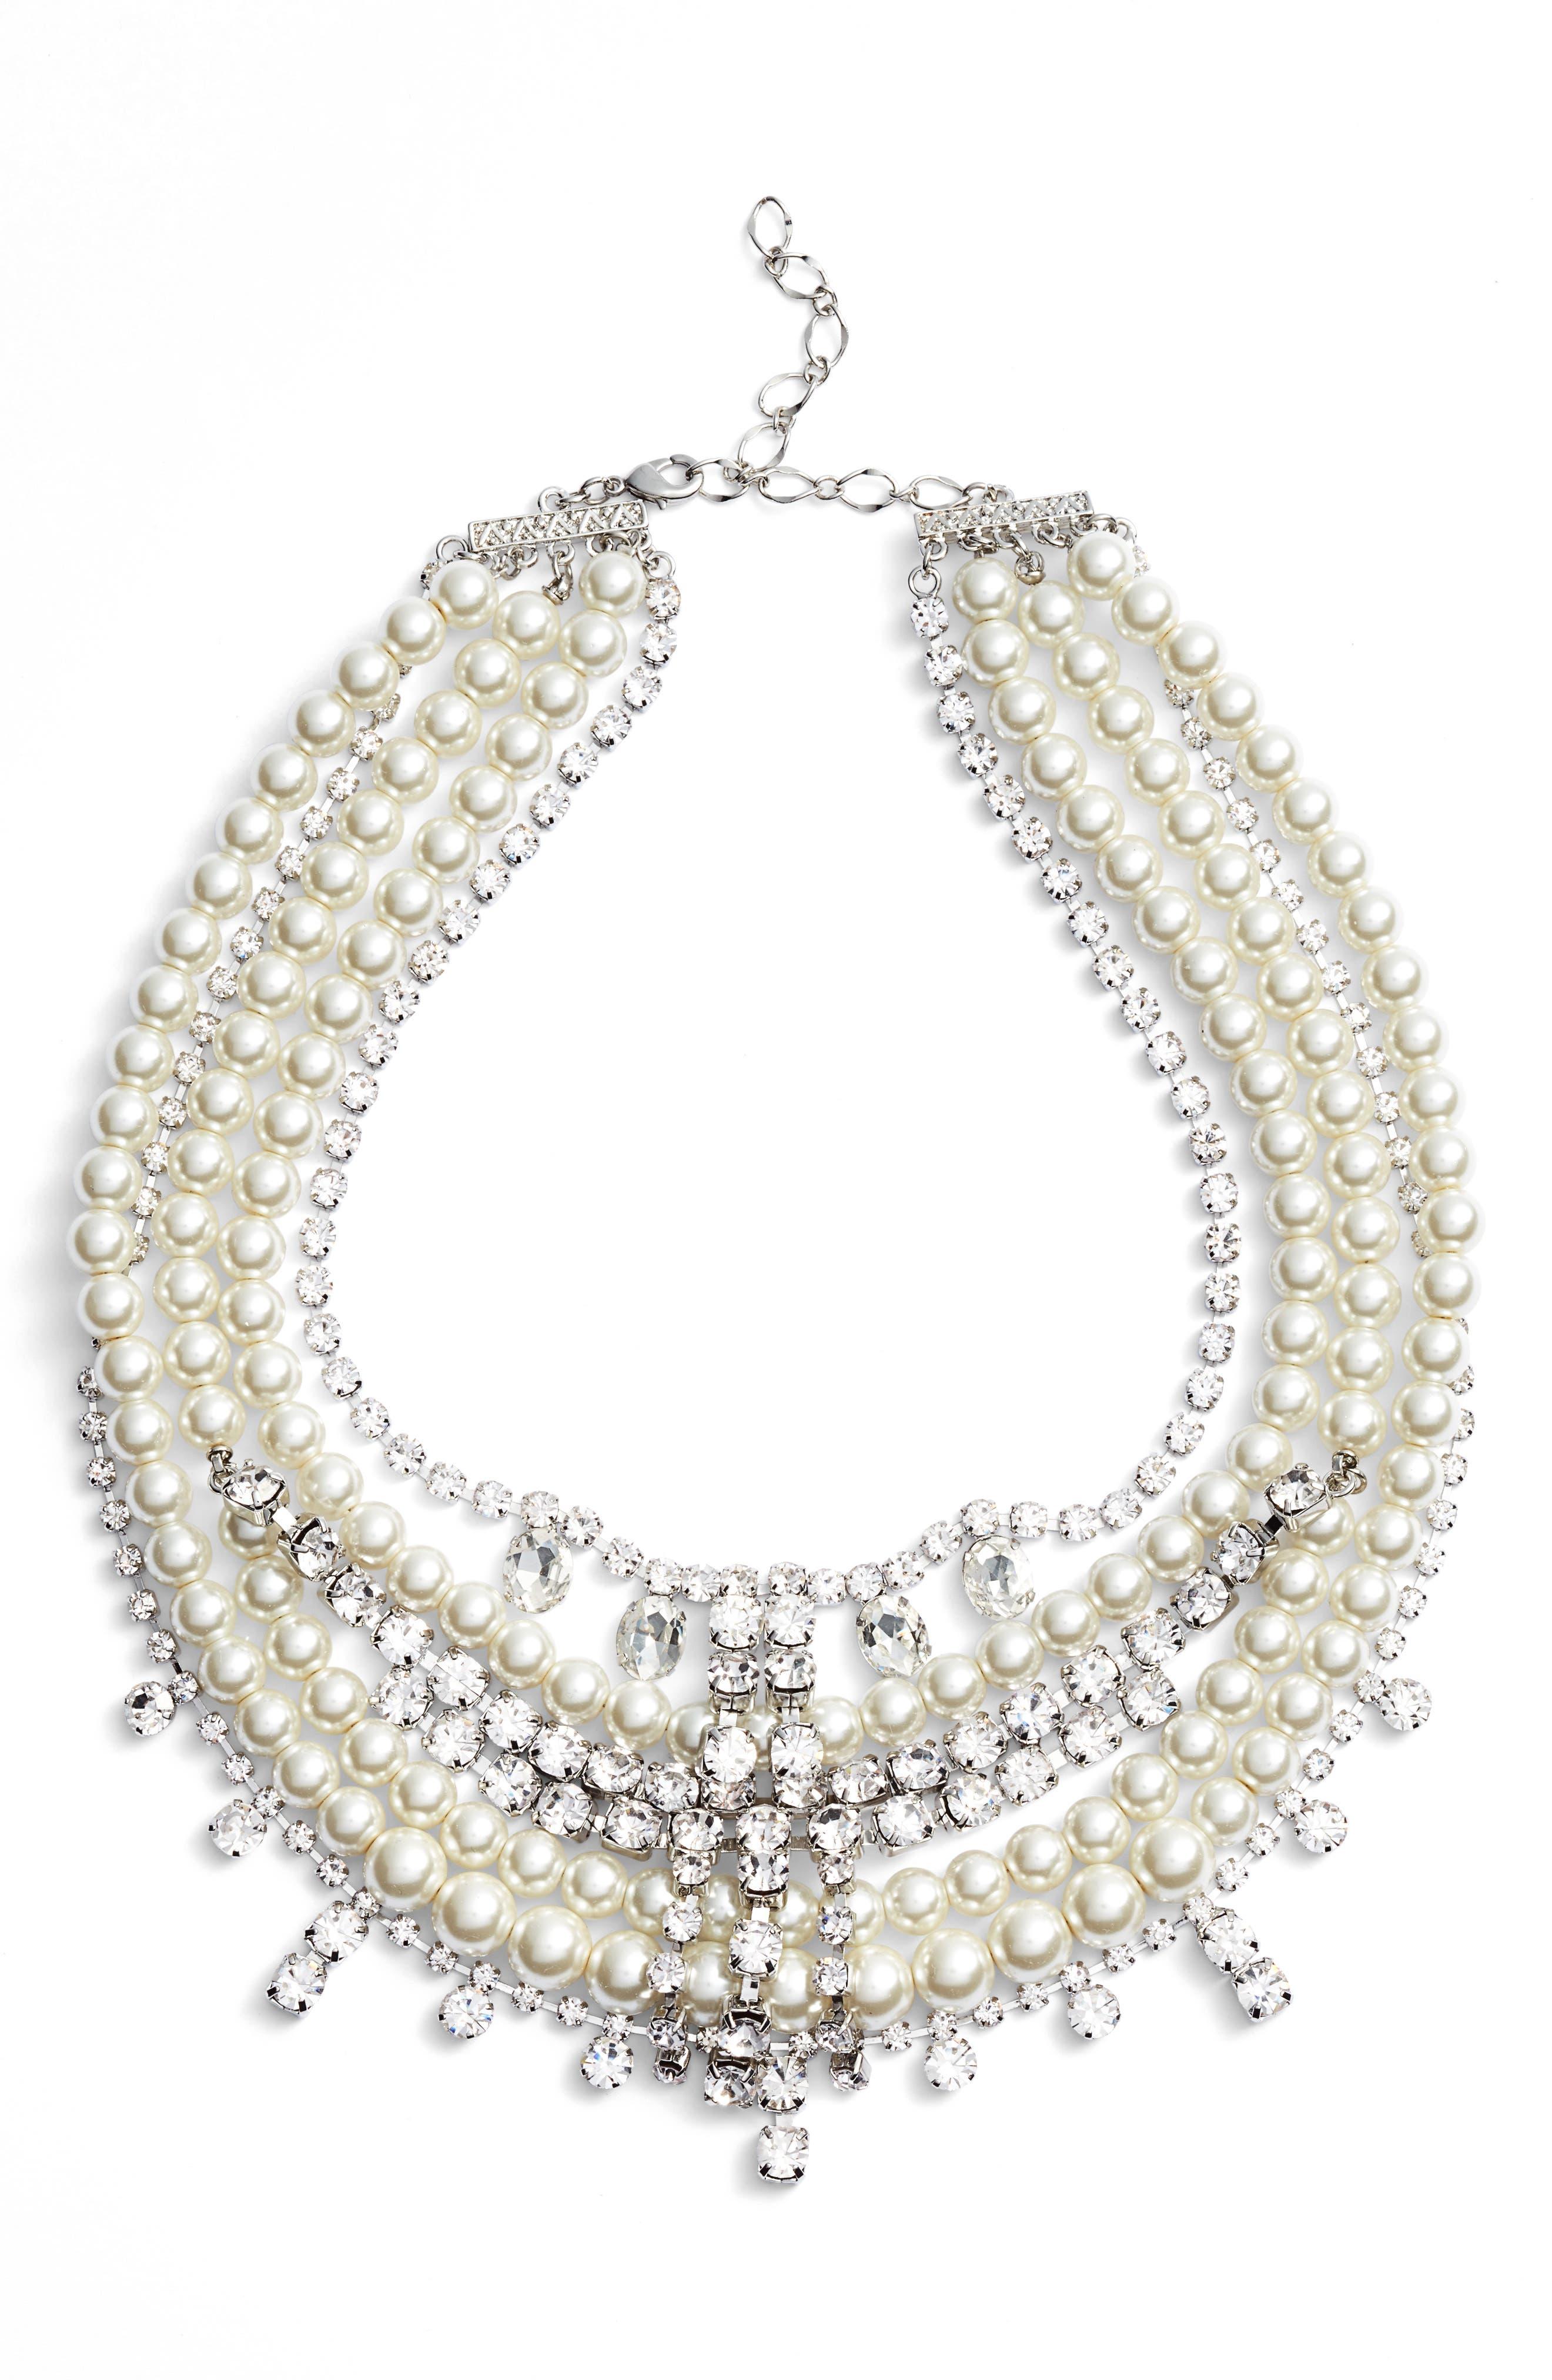 Crystal & Imitation Pearl Multistrand Necklace,                             Main thumbnail 1, color,                             SILVER